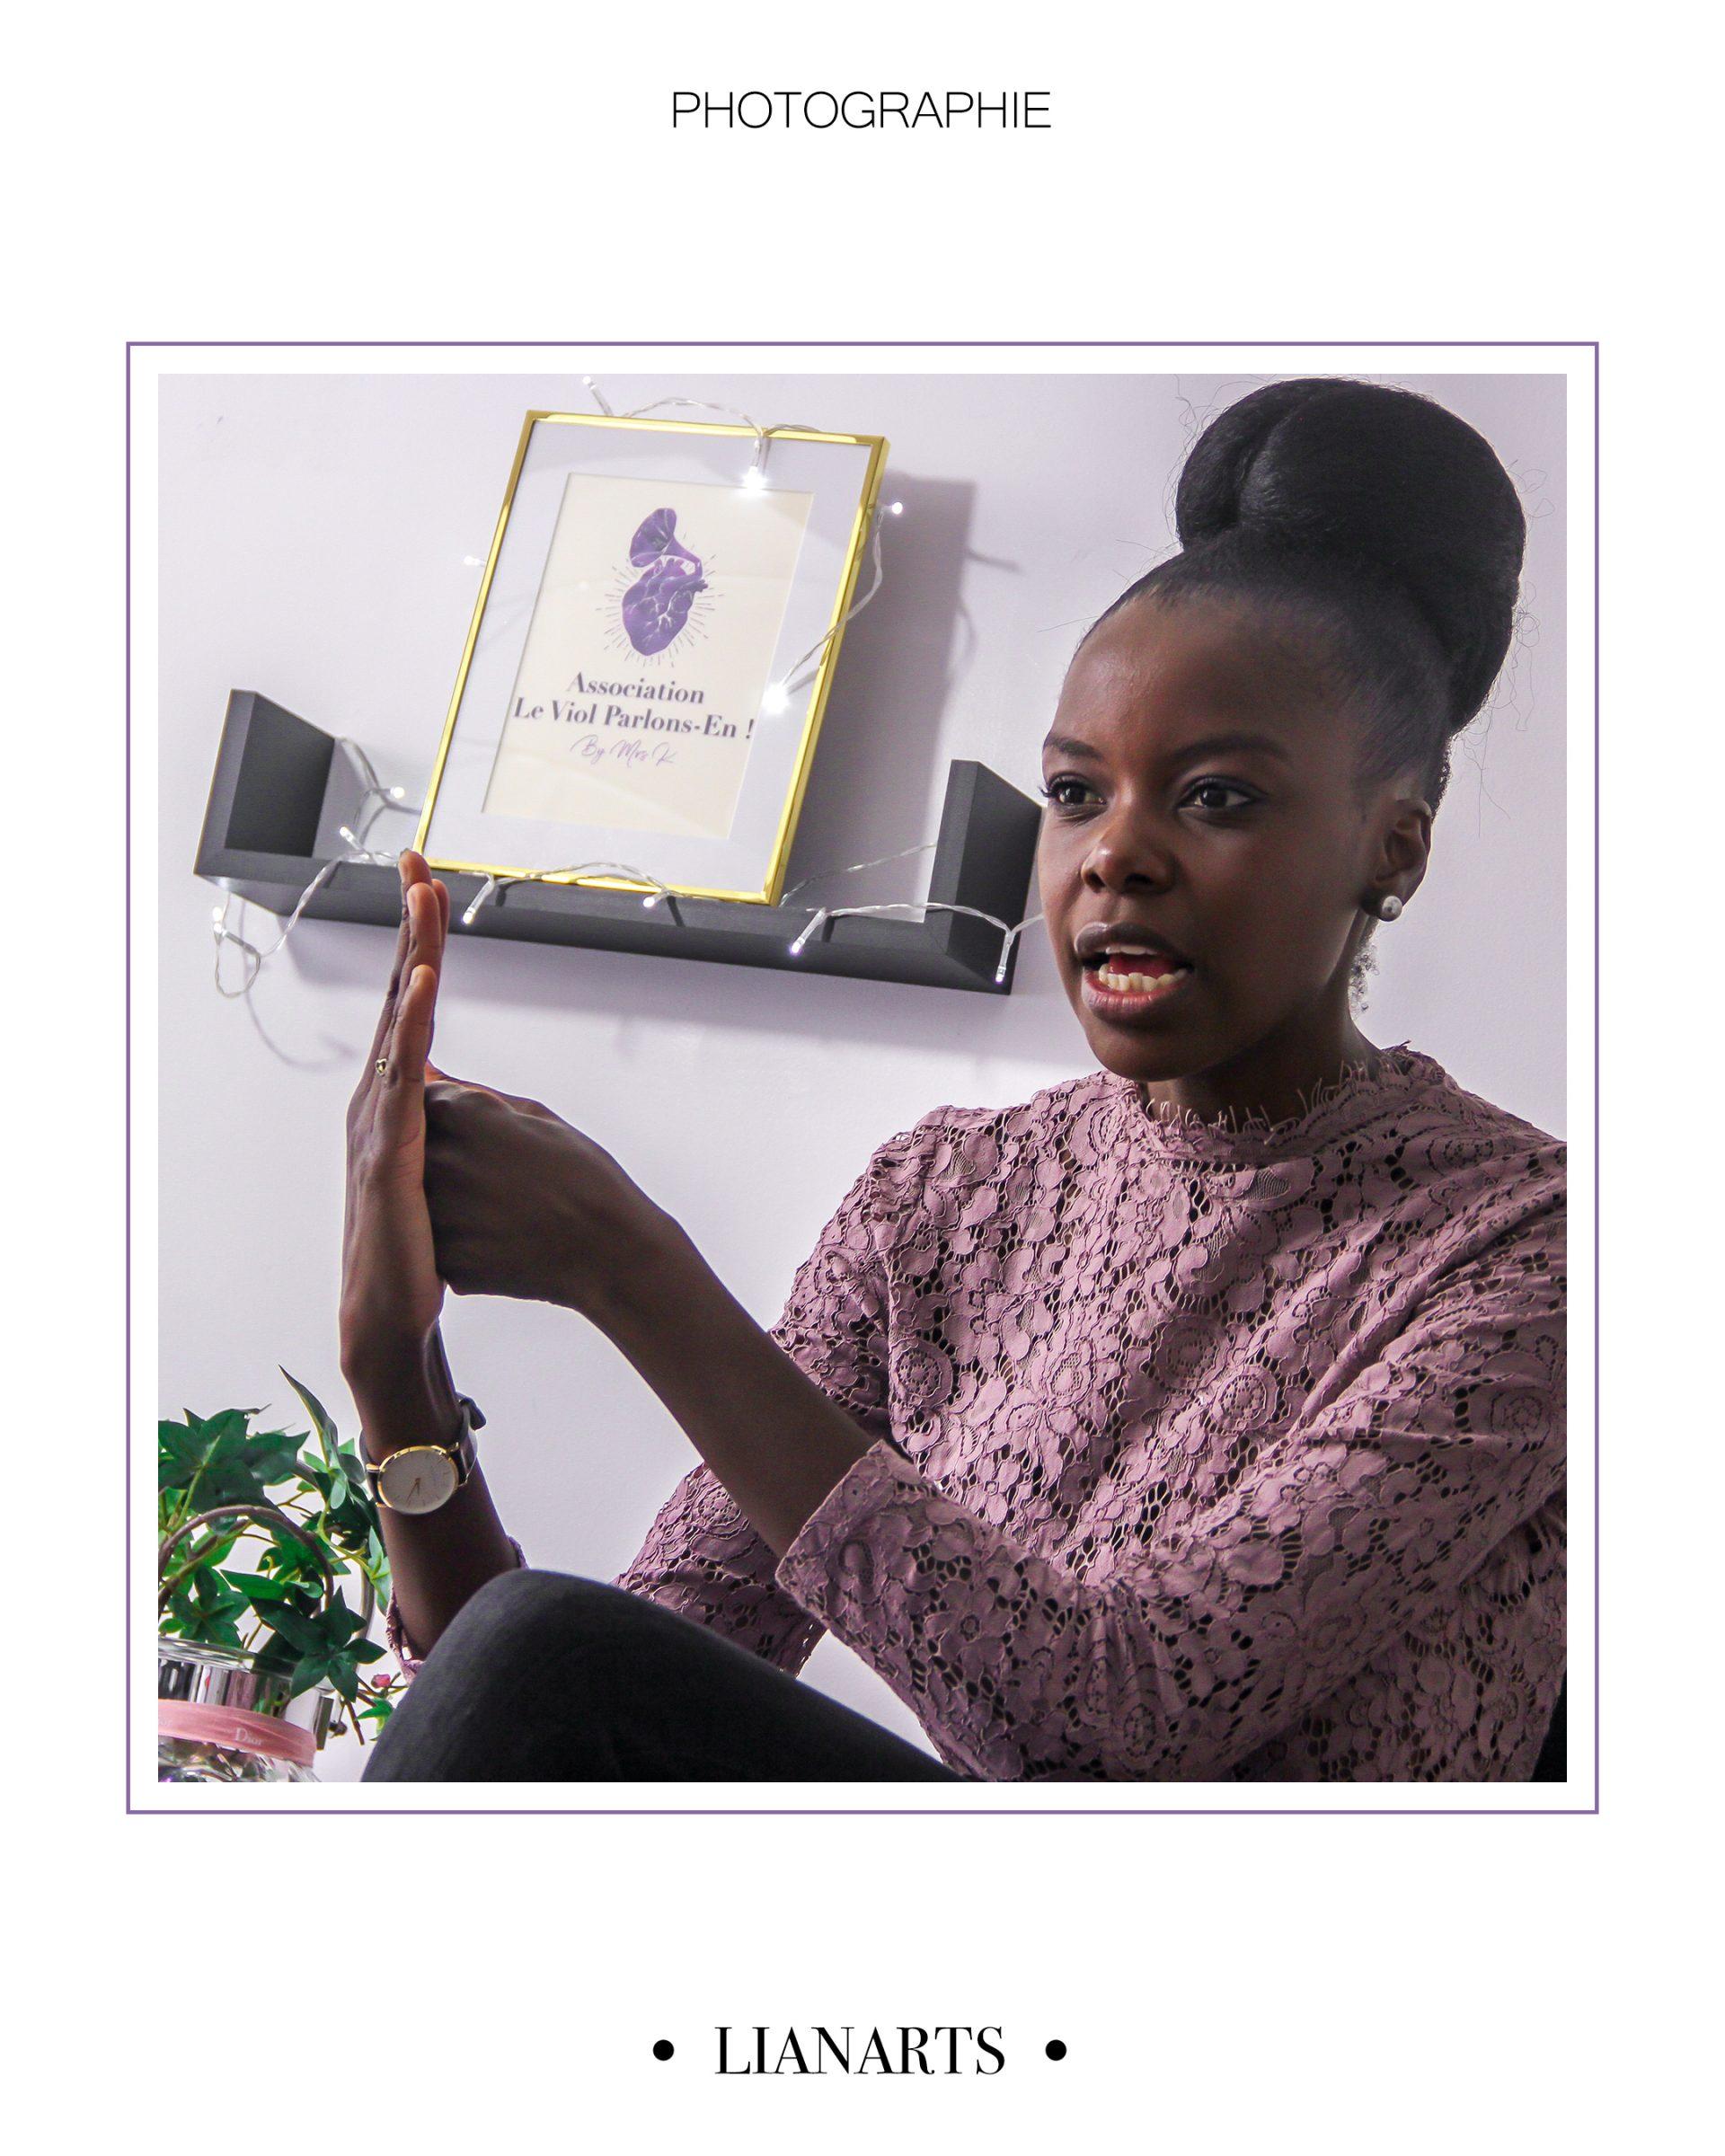 Projet - LVPE & ONU Femmes France - Création LianArts